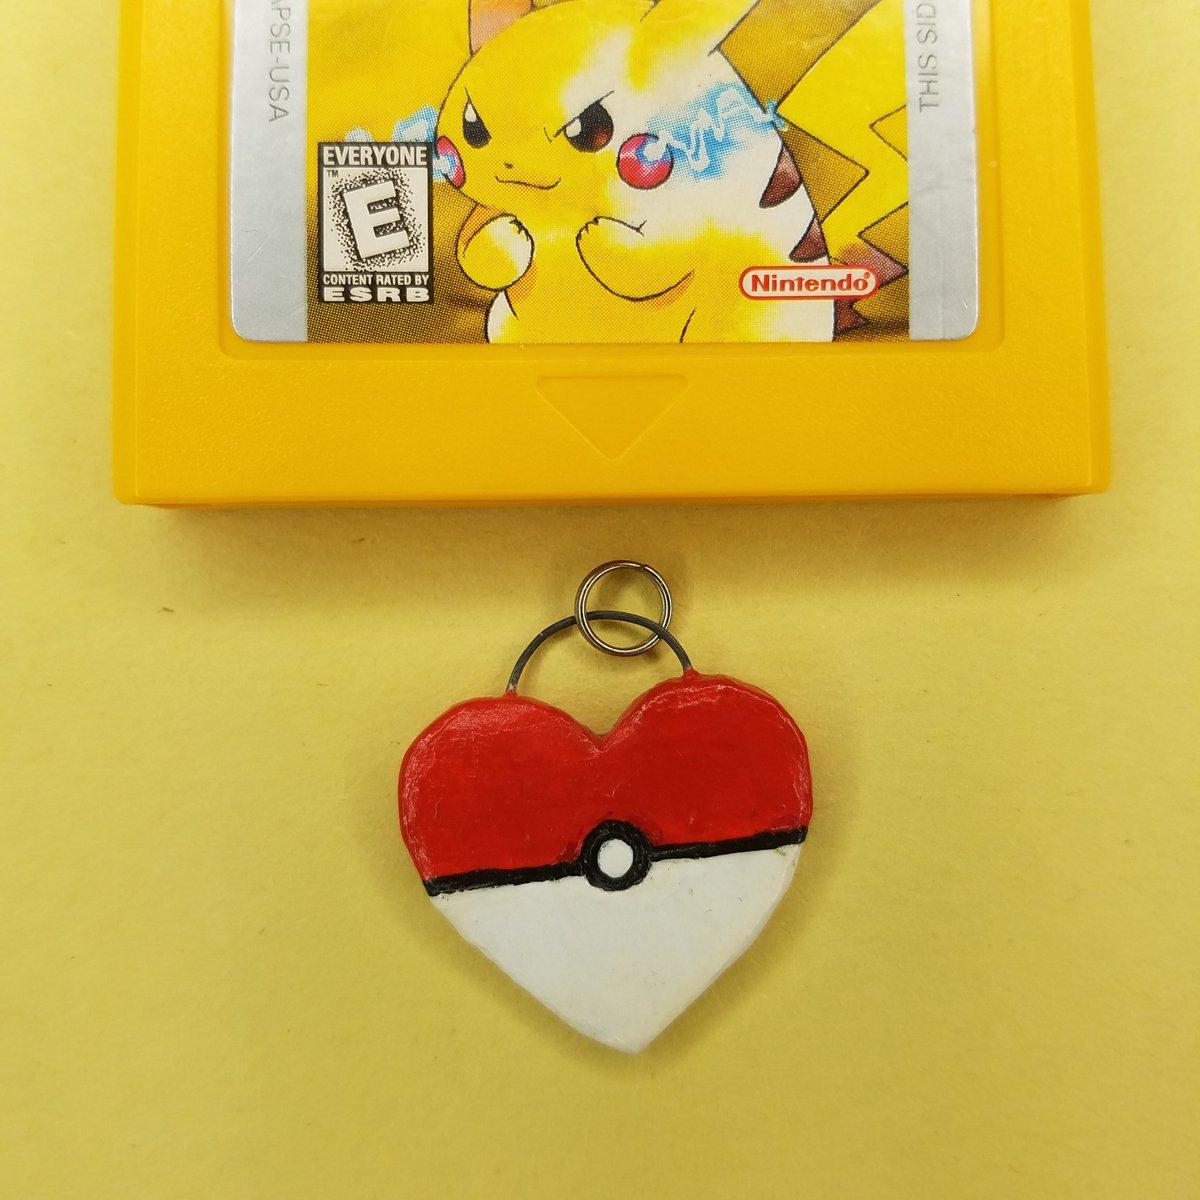 Gotta catch 'em all  #pokemon #clay pic.twitter.com/3kFfor61bg